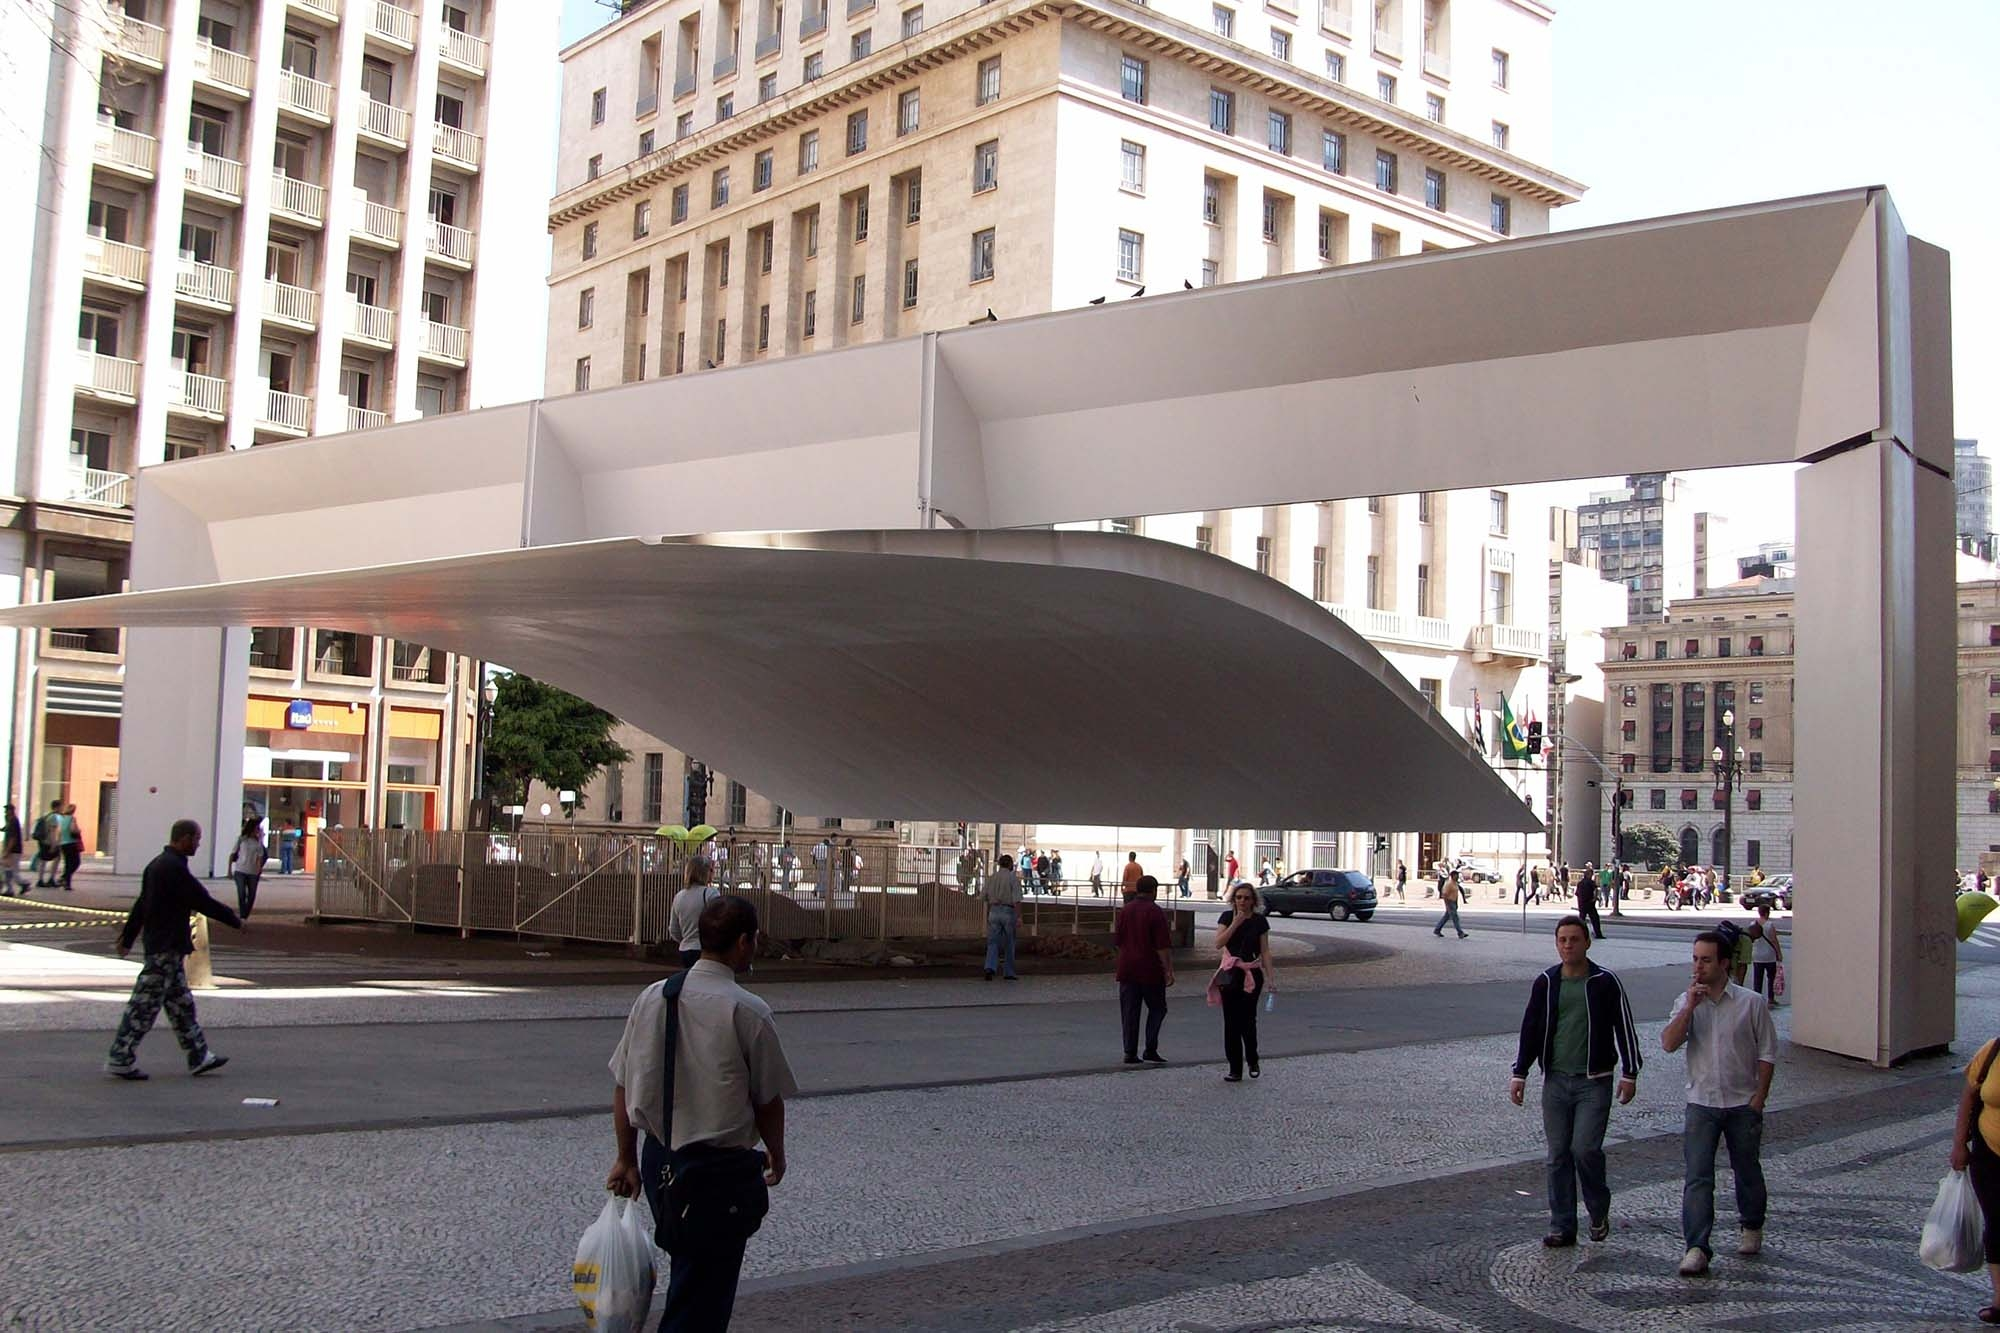 Mendes da Rocha Patriarch Plaza and Viaduct do Cha São Paulo Brazil 1992 2000x1333 c